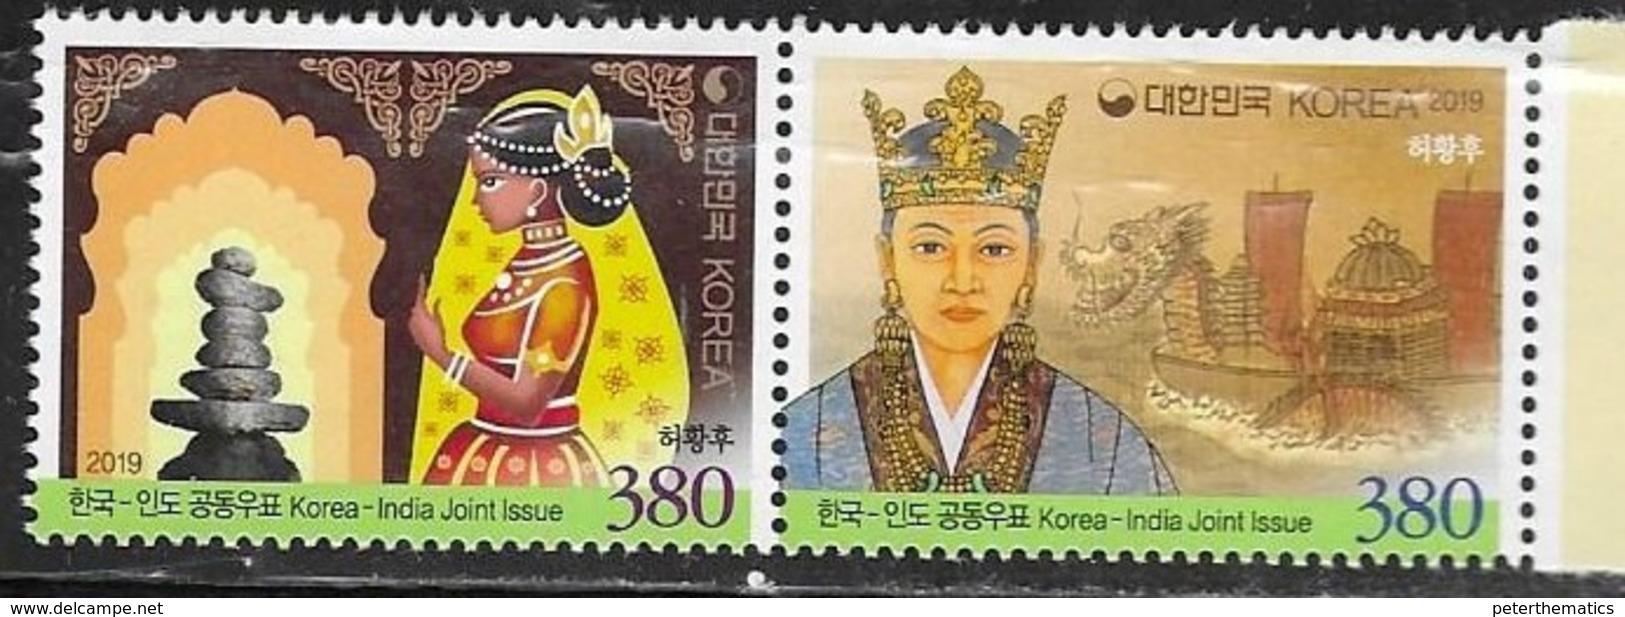 SOUTH KOREA, 2019, MNH, JOINT ISSUE WITH INDIA, SHIPS, 2v - Gezamelijke Uitgaven